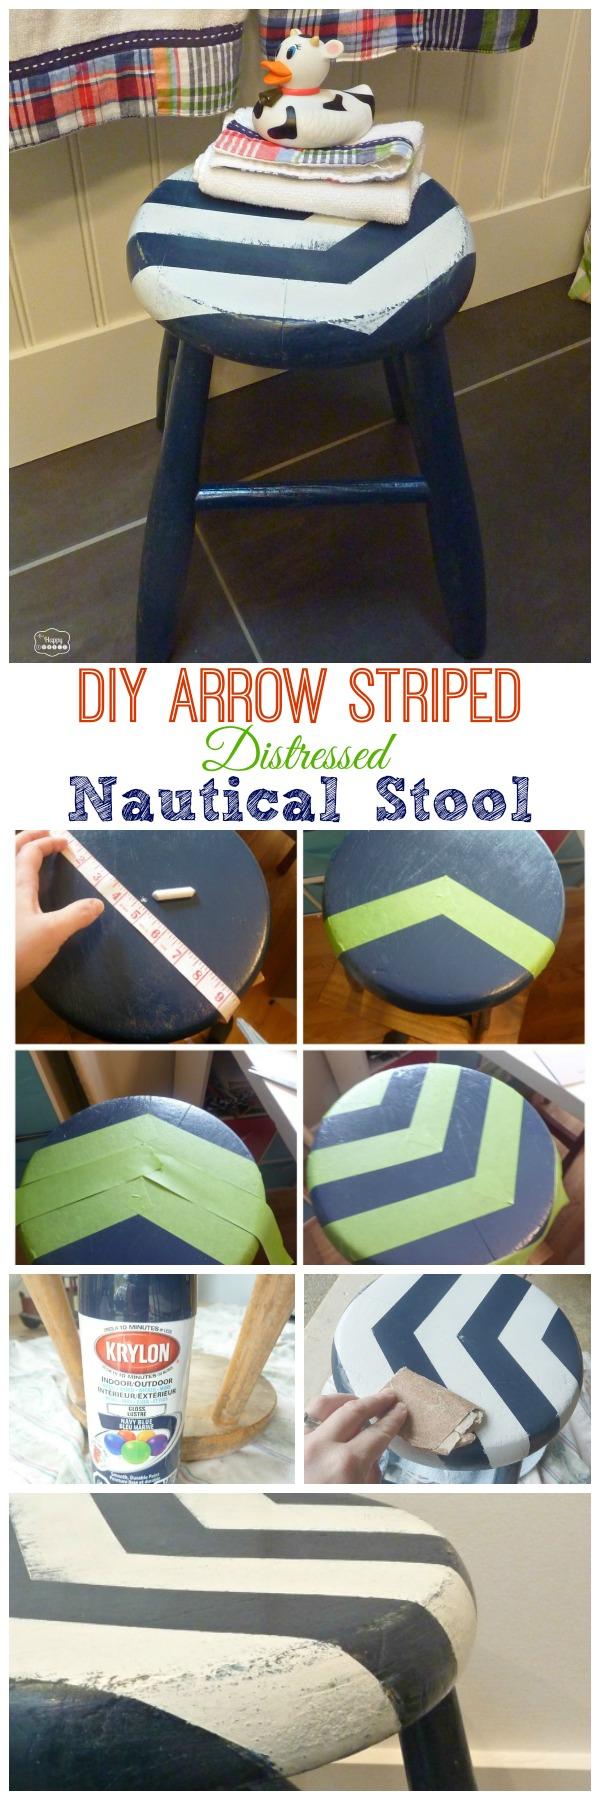 DIY Arrow Striped Distressed Nautical Stool for our Boys Nautical Theme Bathroom graphic.